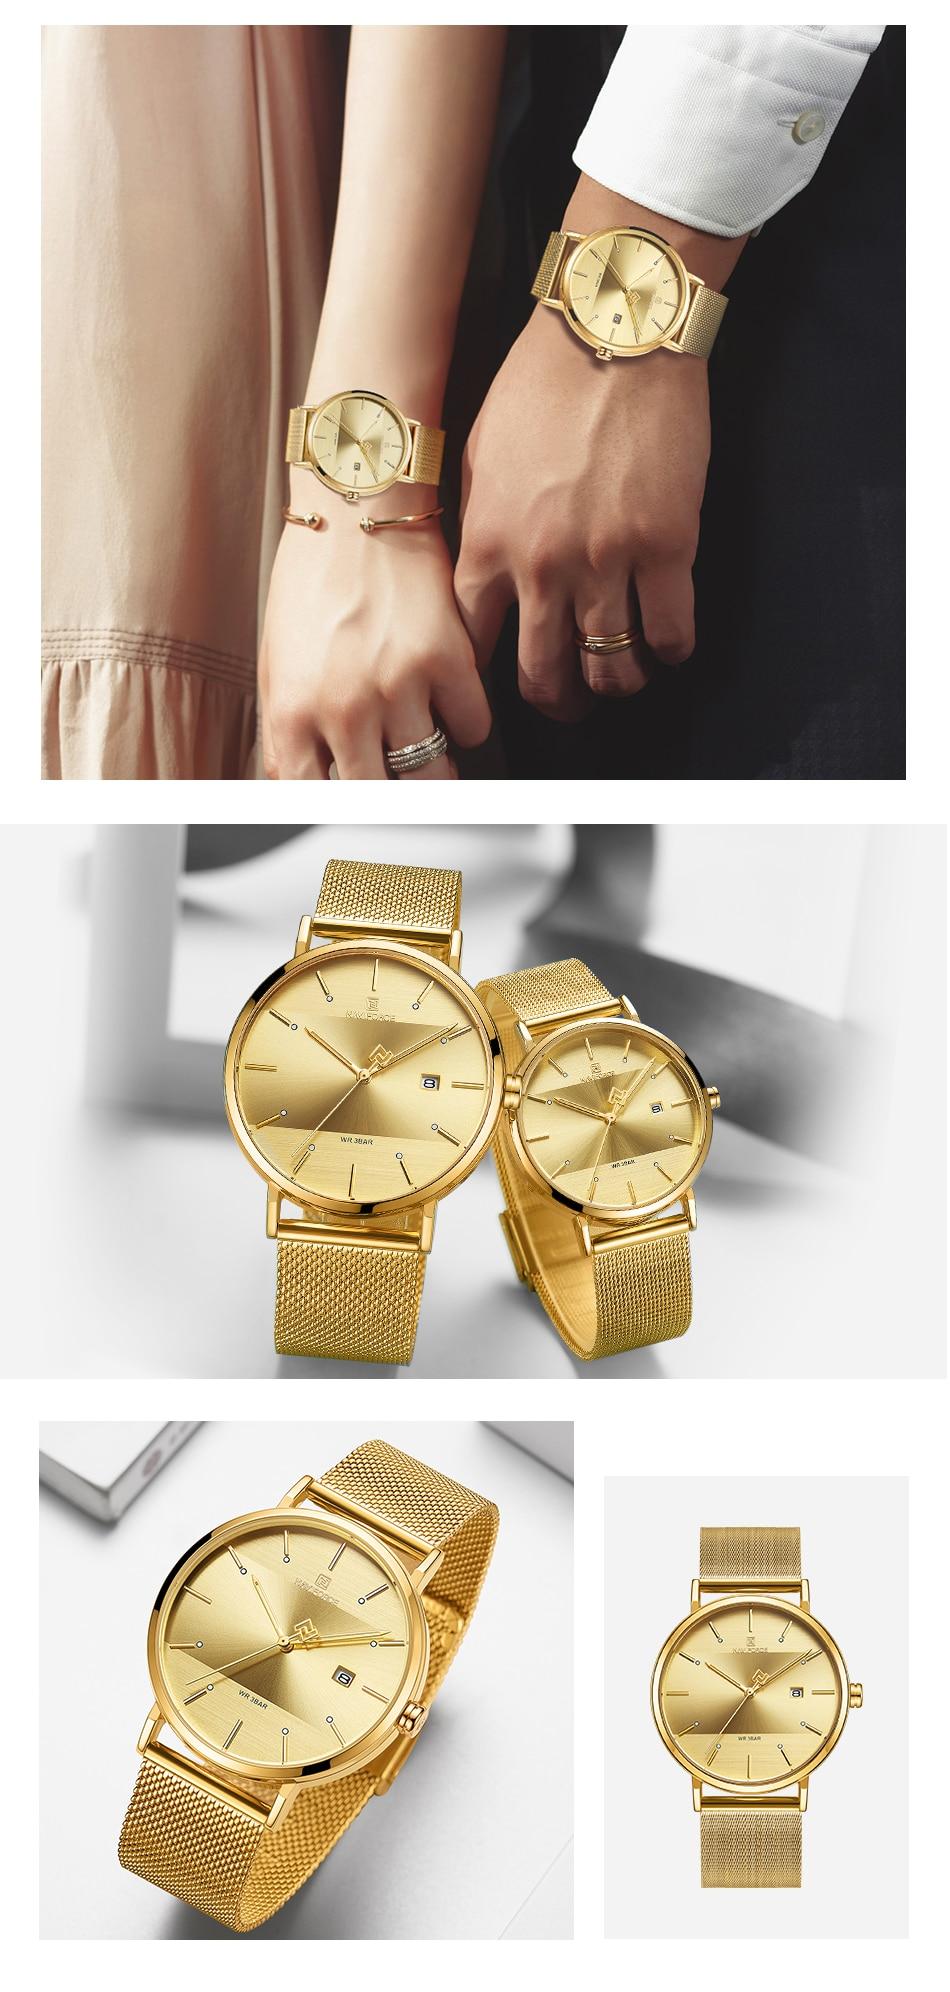 NAVIFORCE New Stylish Women Watches Top Brand Luxury Stainless Steel Strap Quartz Wristwatch For Woman Bracelet Watch 2019 Gift (18)